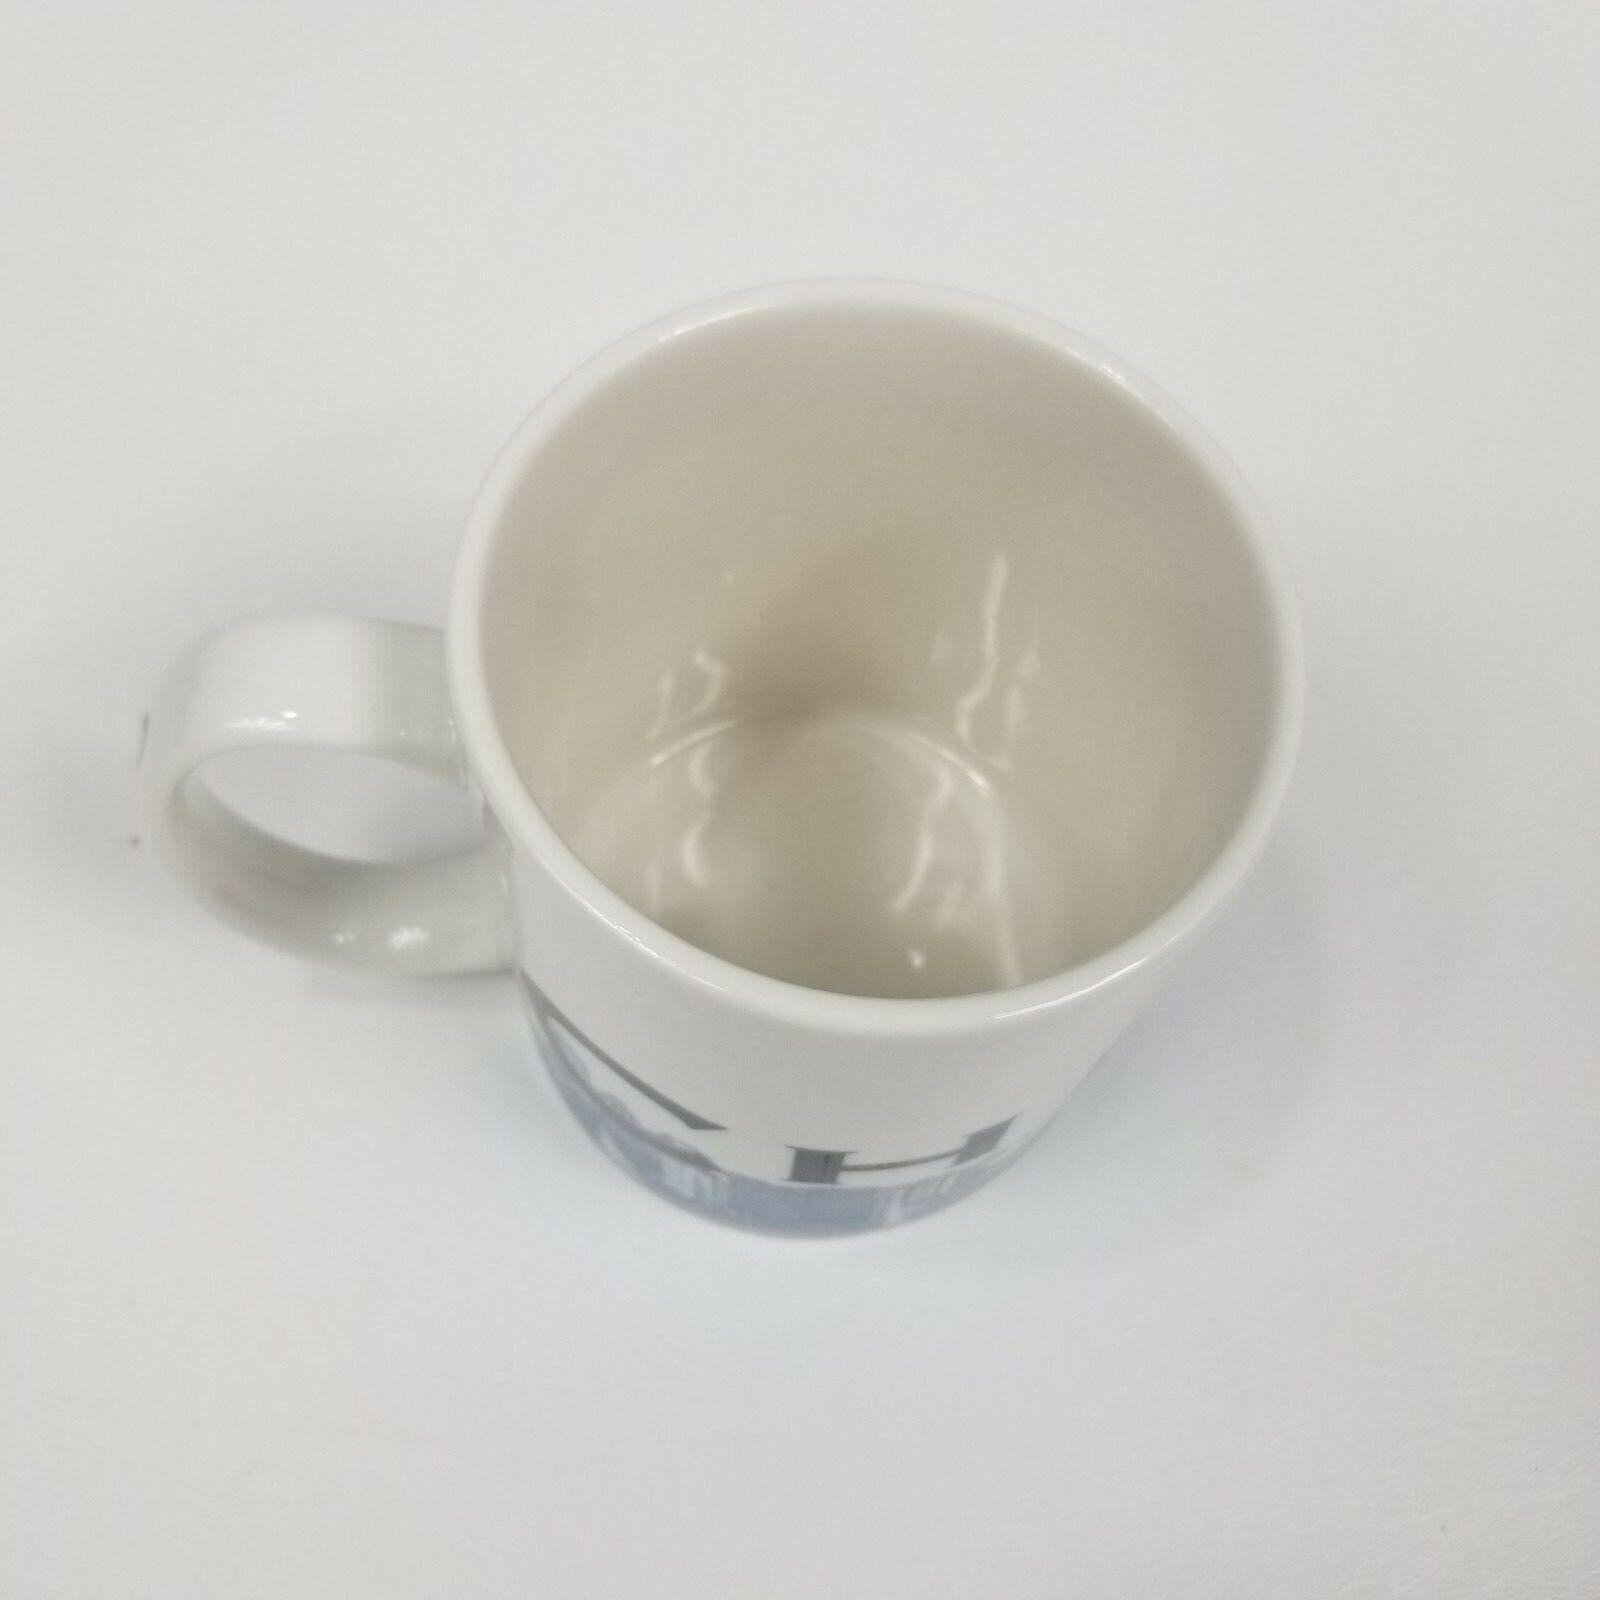 Starbucks Chicago Skyline Series Mug Coffee Cup Tea Large Windy City Barista image 3